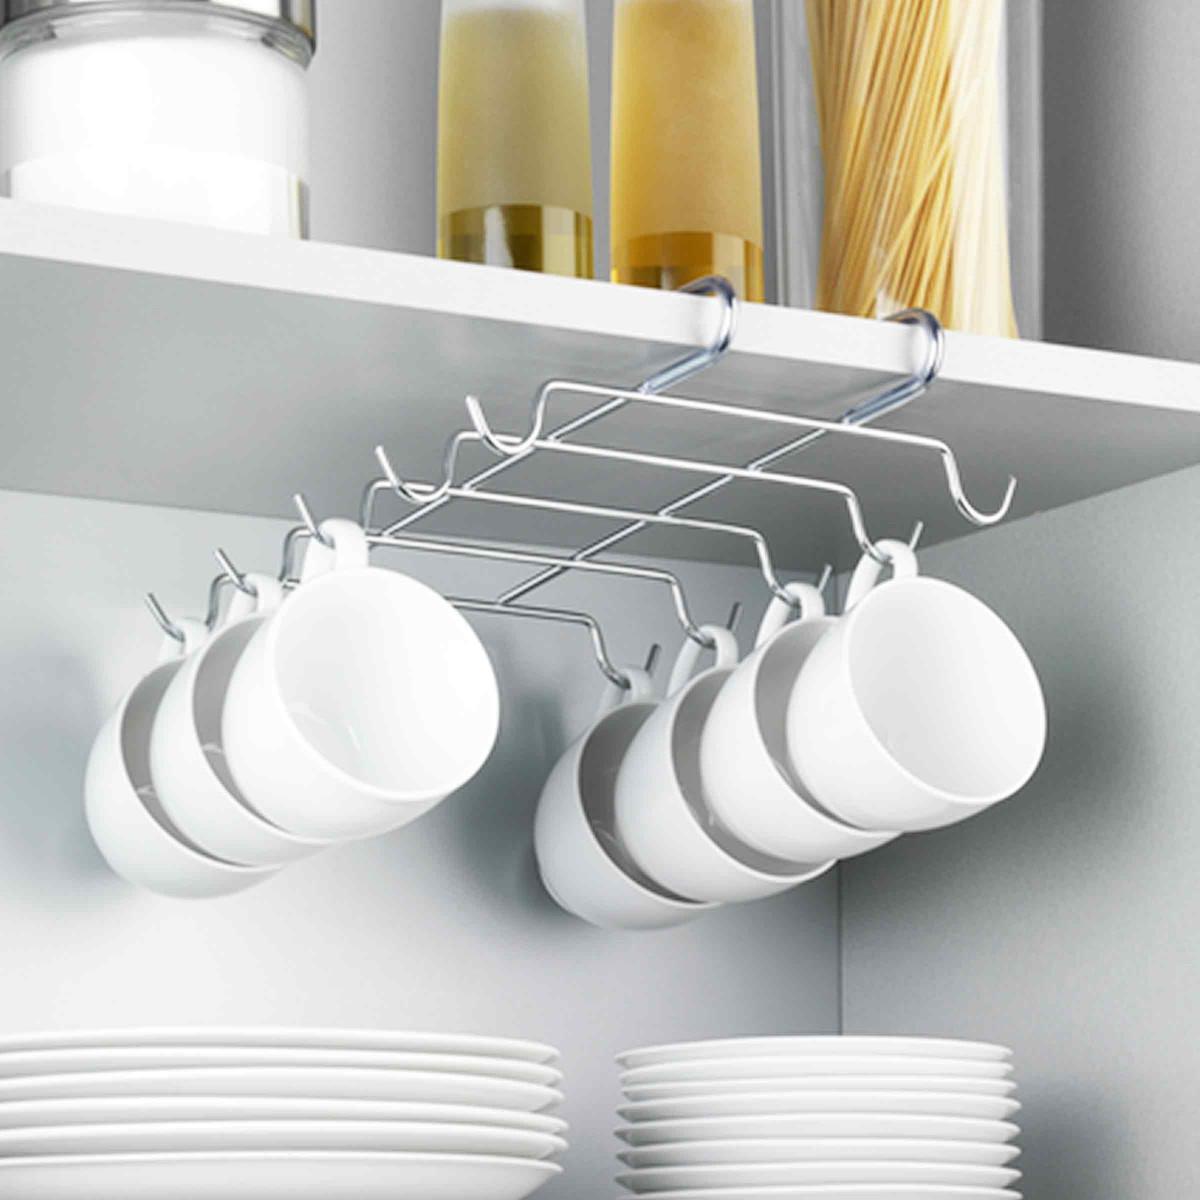 porte tasses rack pour 10 tasses rangement. Black Bedroom Furniture Sets. Home Design Ideas